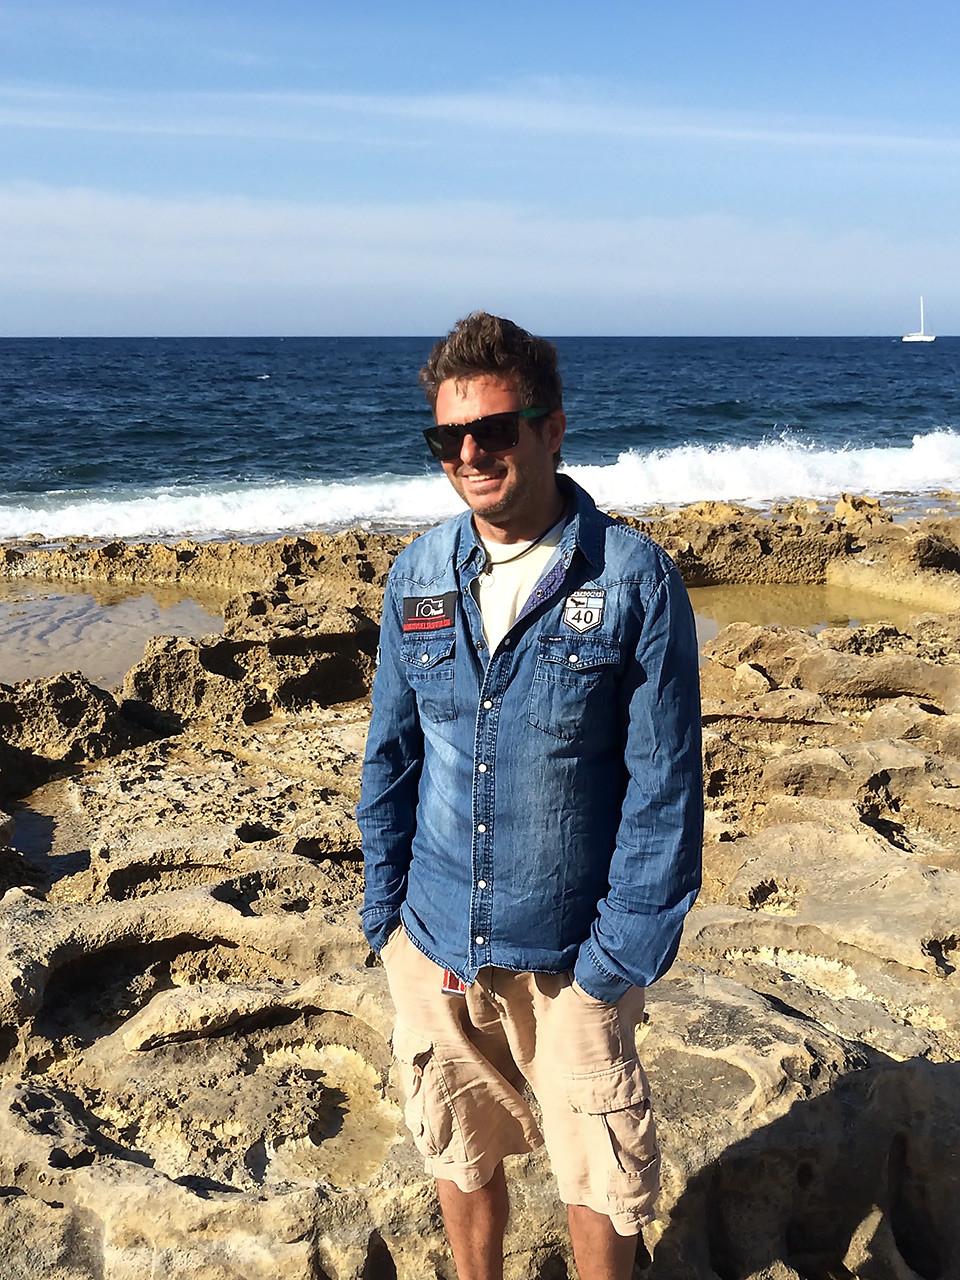 Jose Maria Piasentini, blog de viajes y fotografia